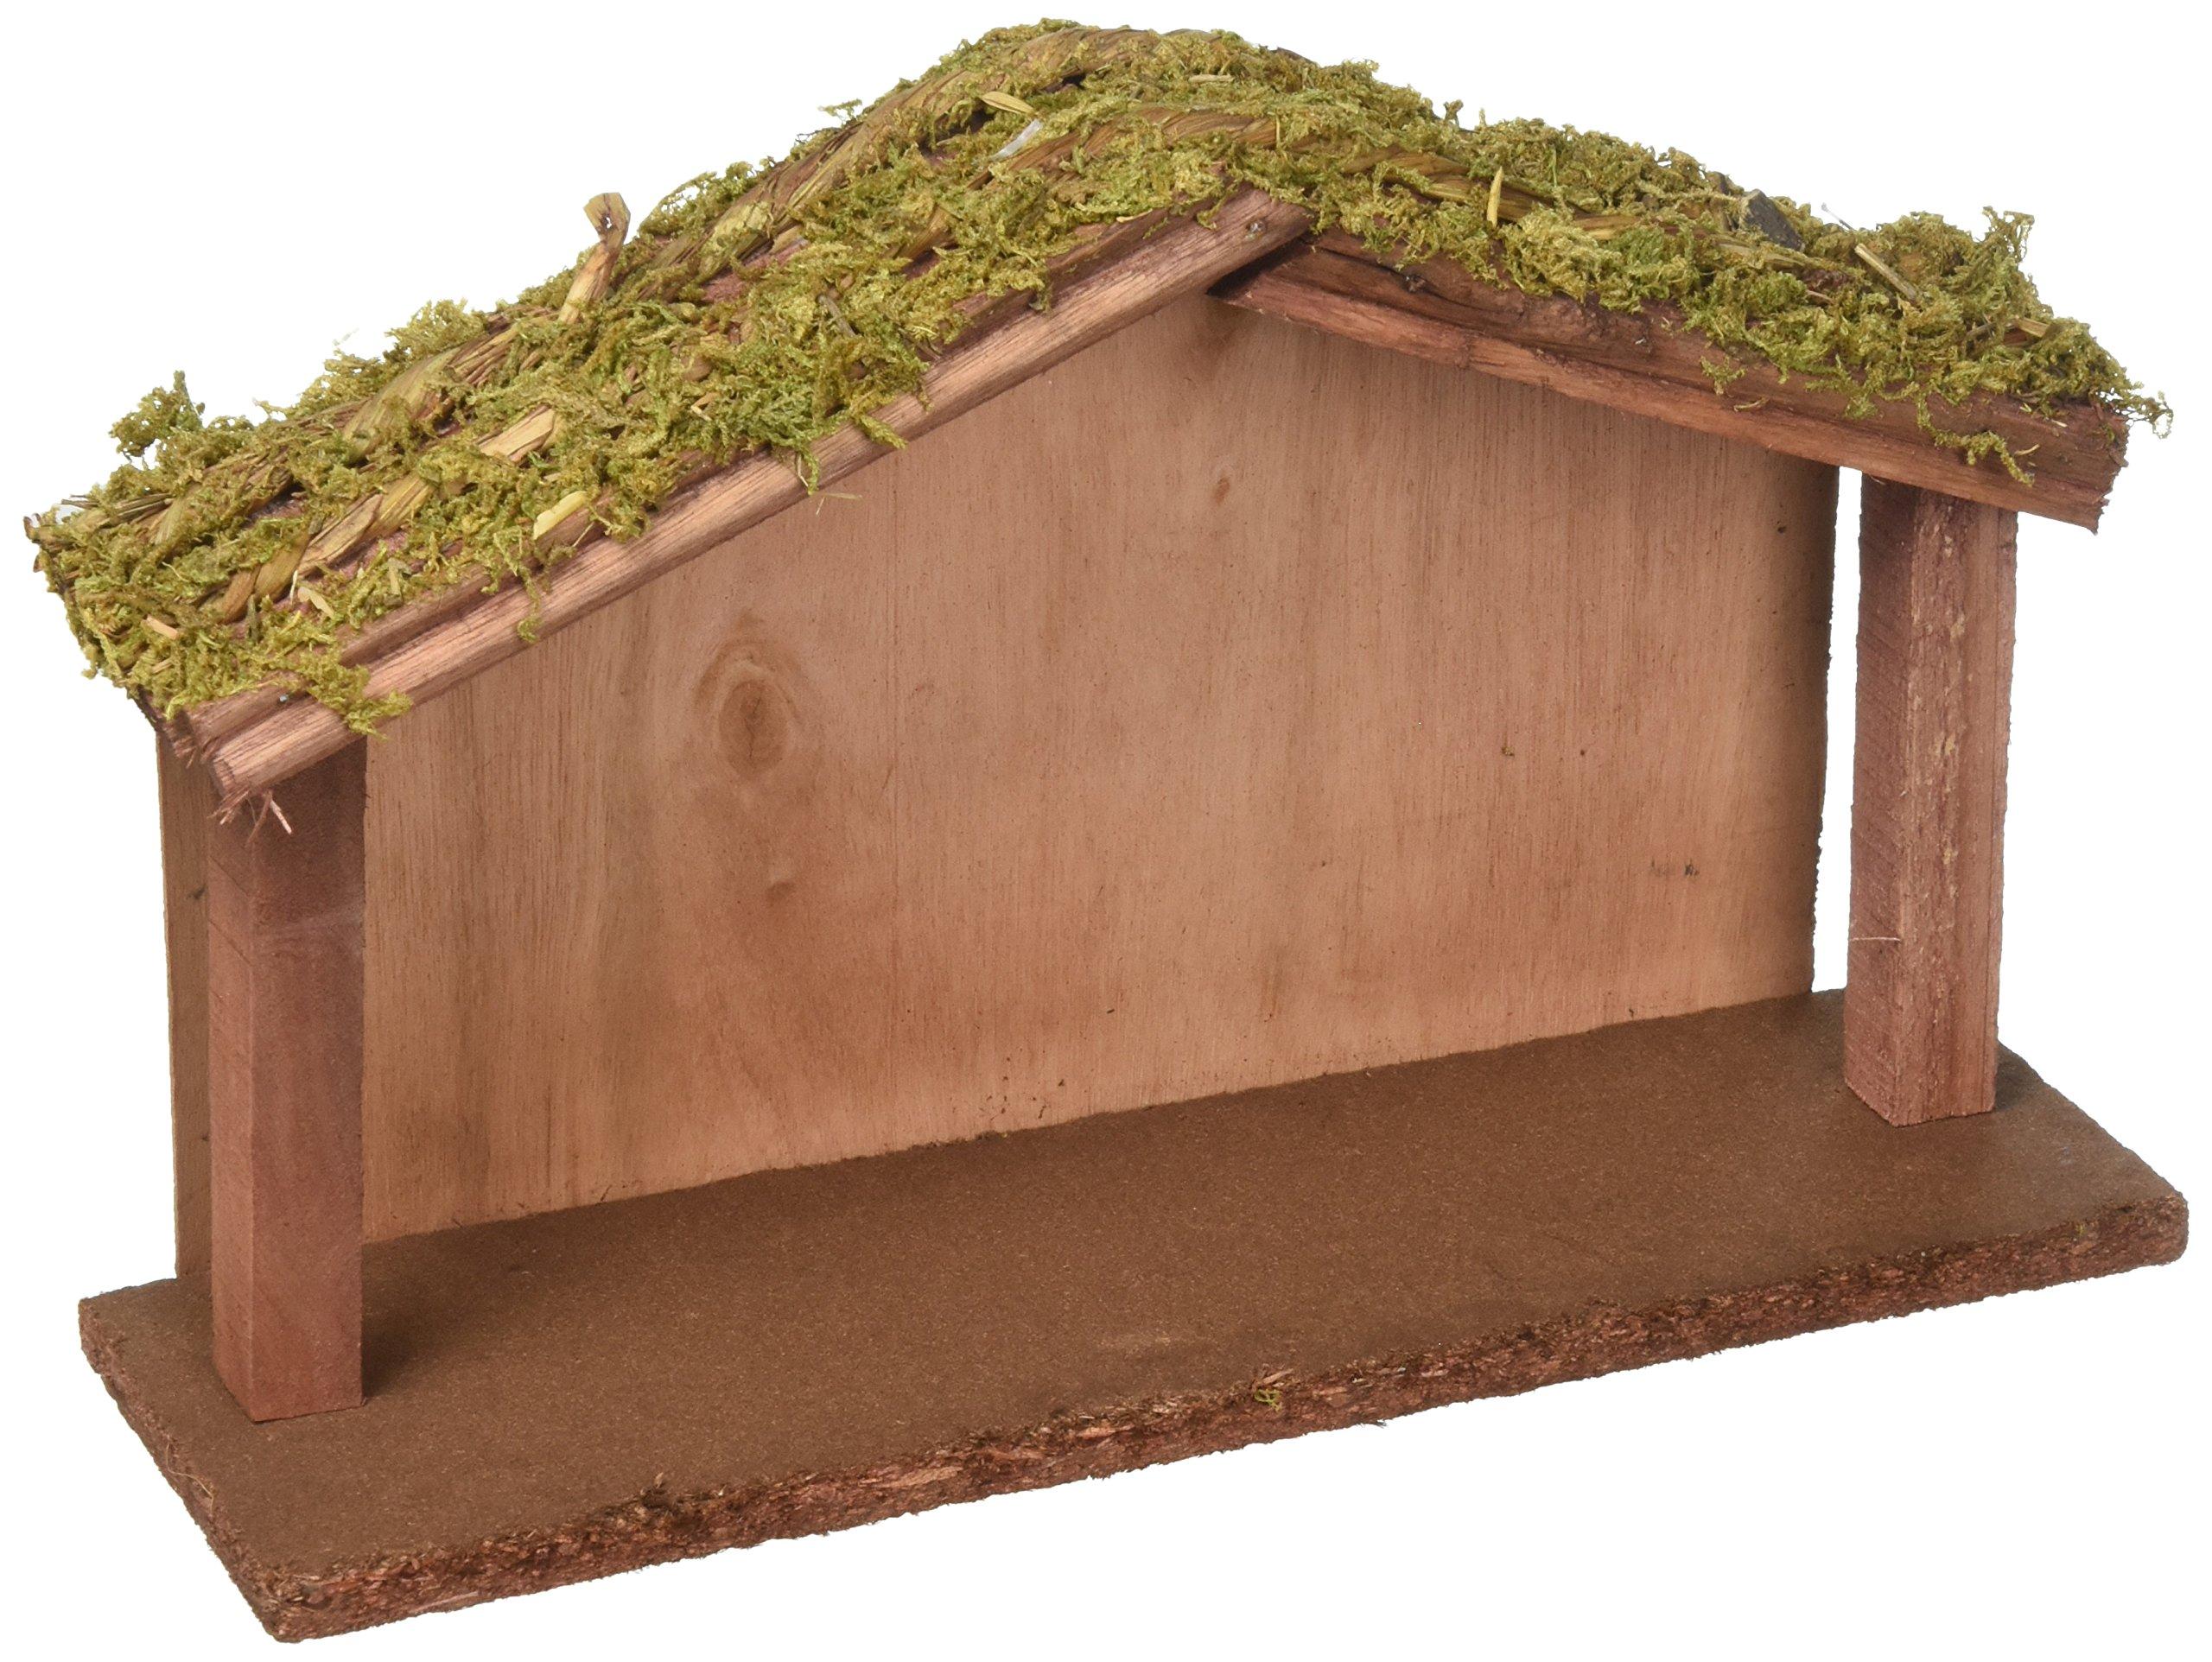 Creative Co-op XC2175 Wood Crèche w Mossy Roof